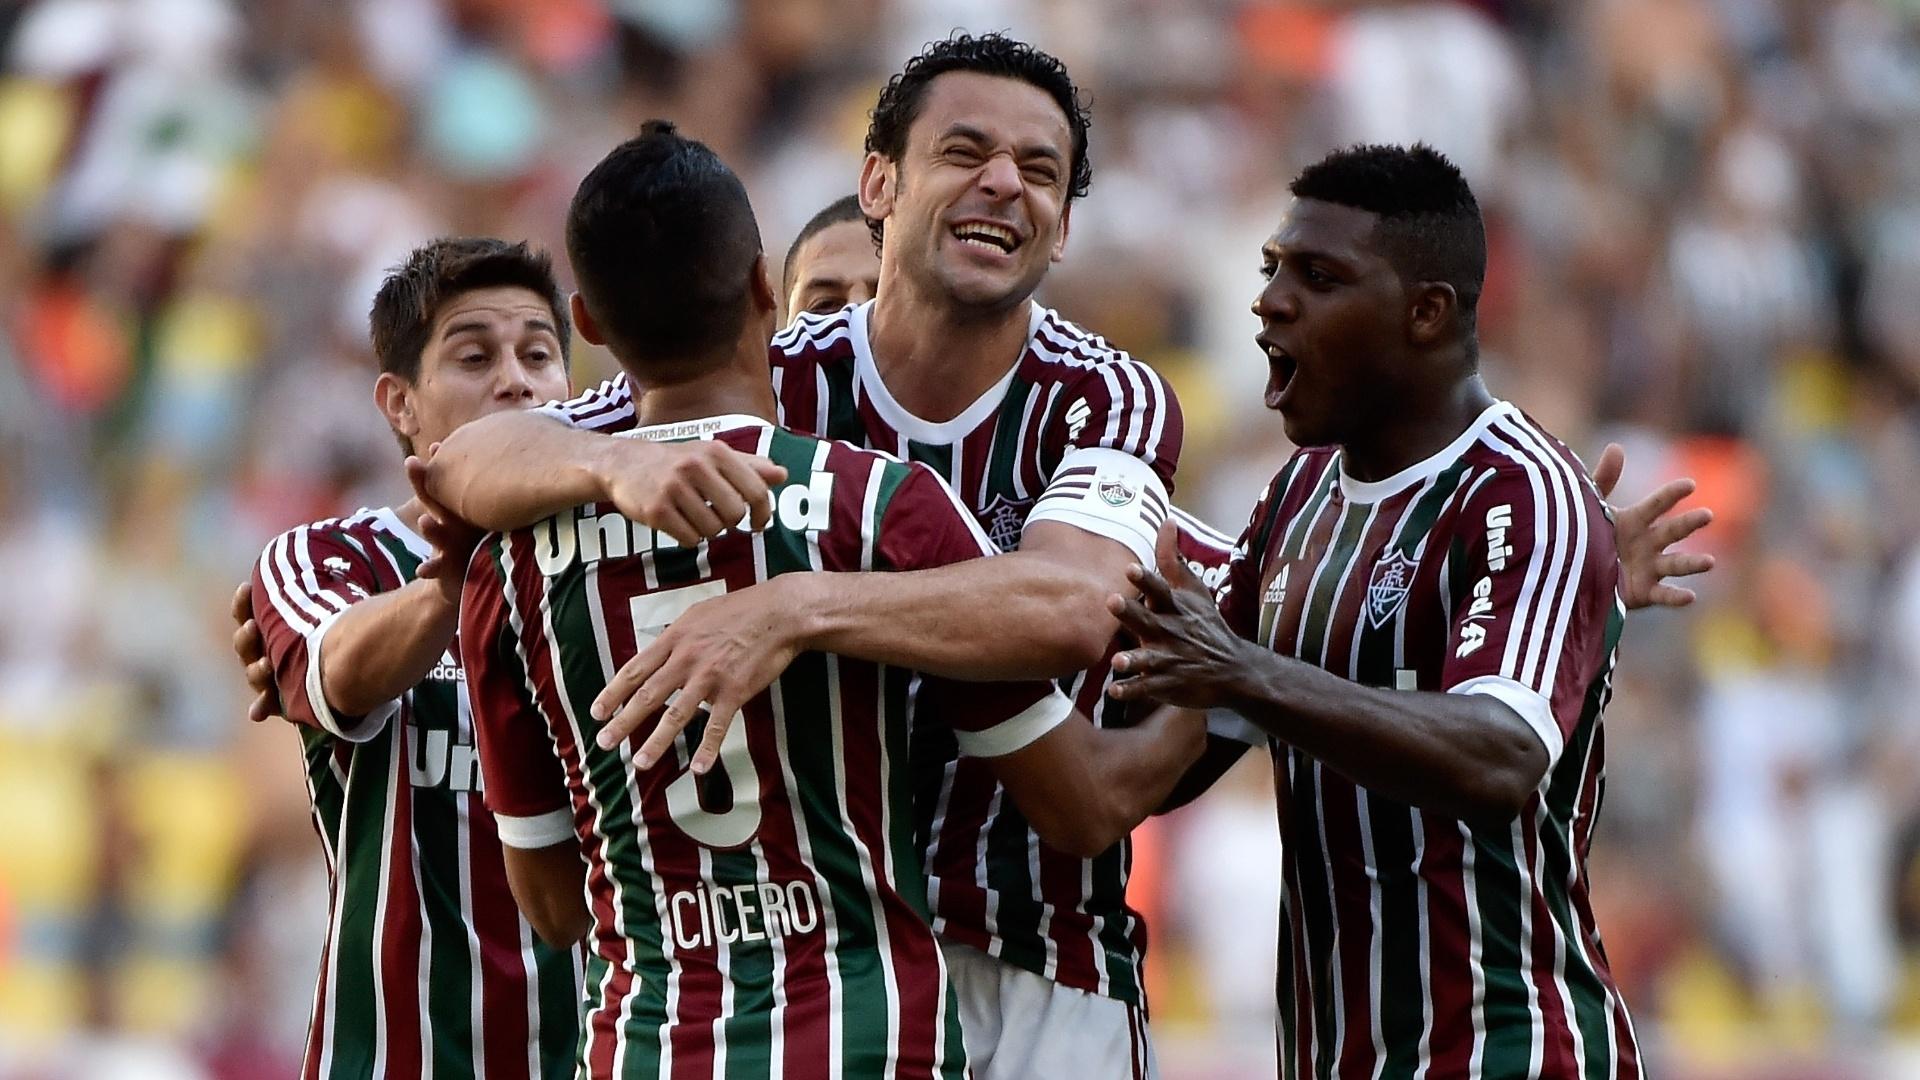 Após marcar, Fred é abraçado pelos jogadores do Fluminense